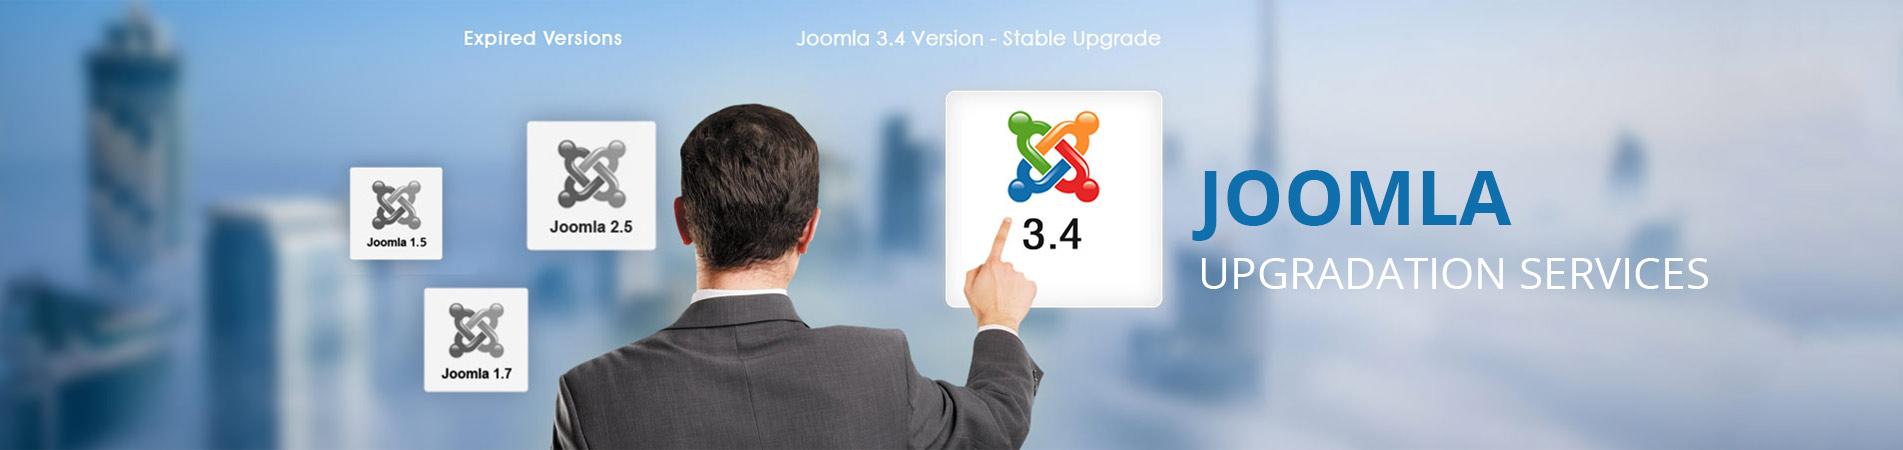 Joomla Upgration Development in Banagalore